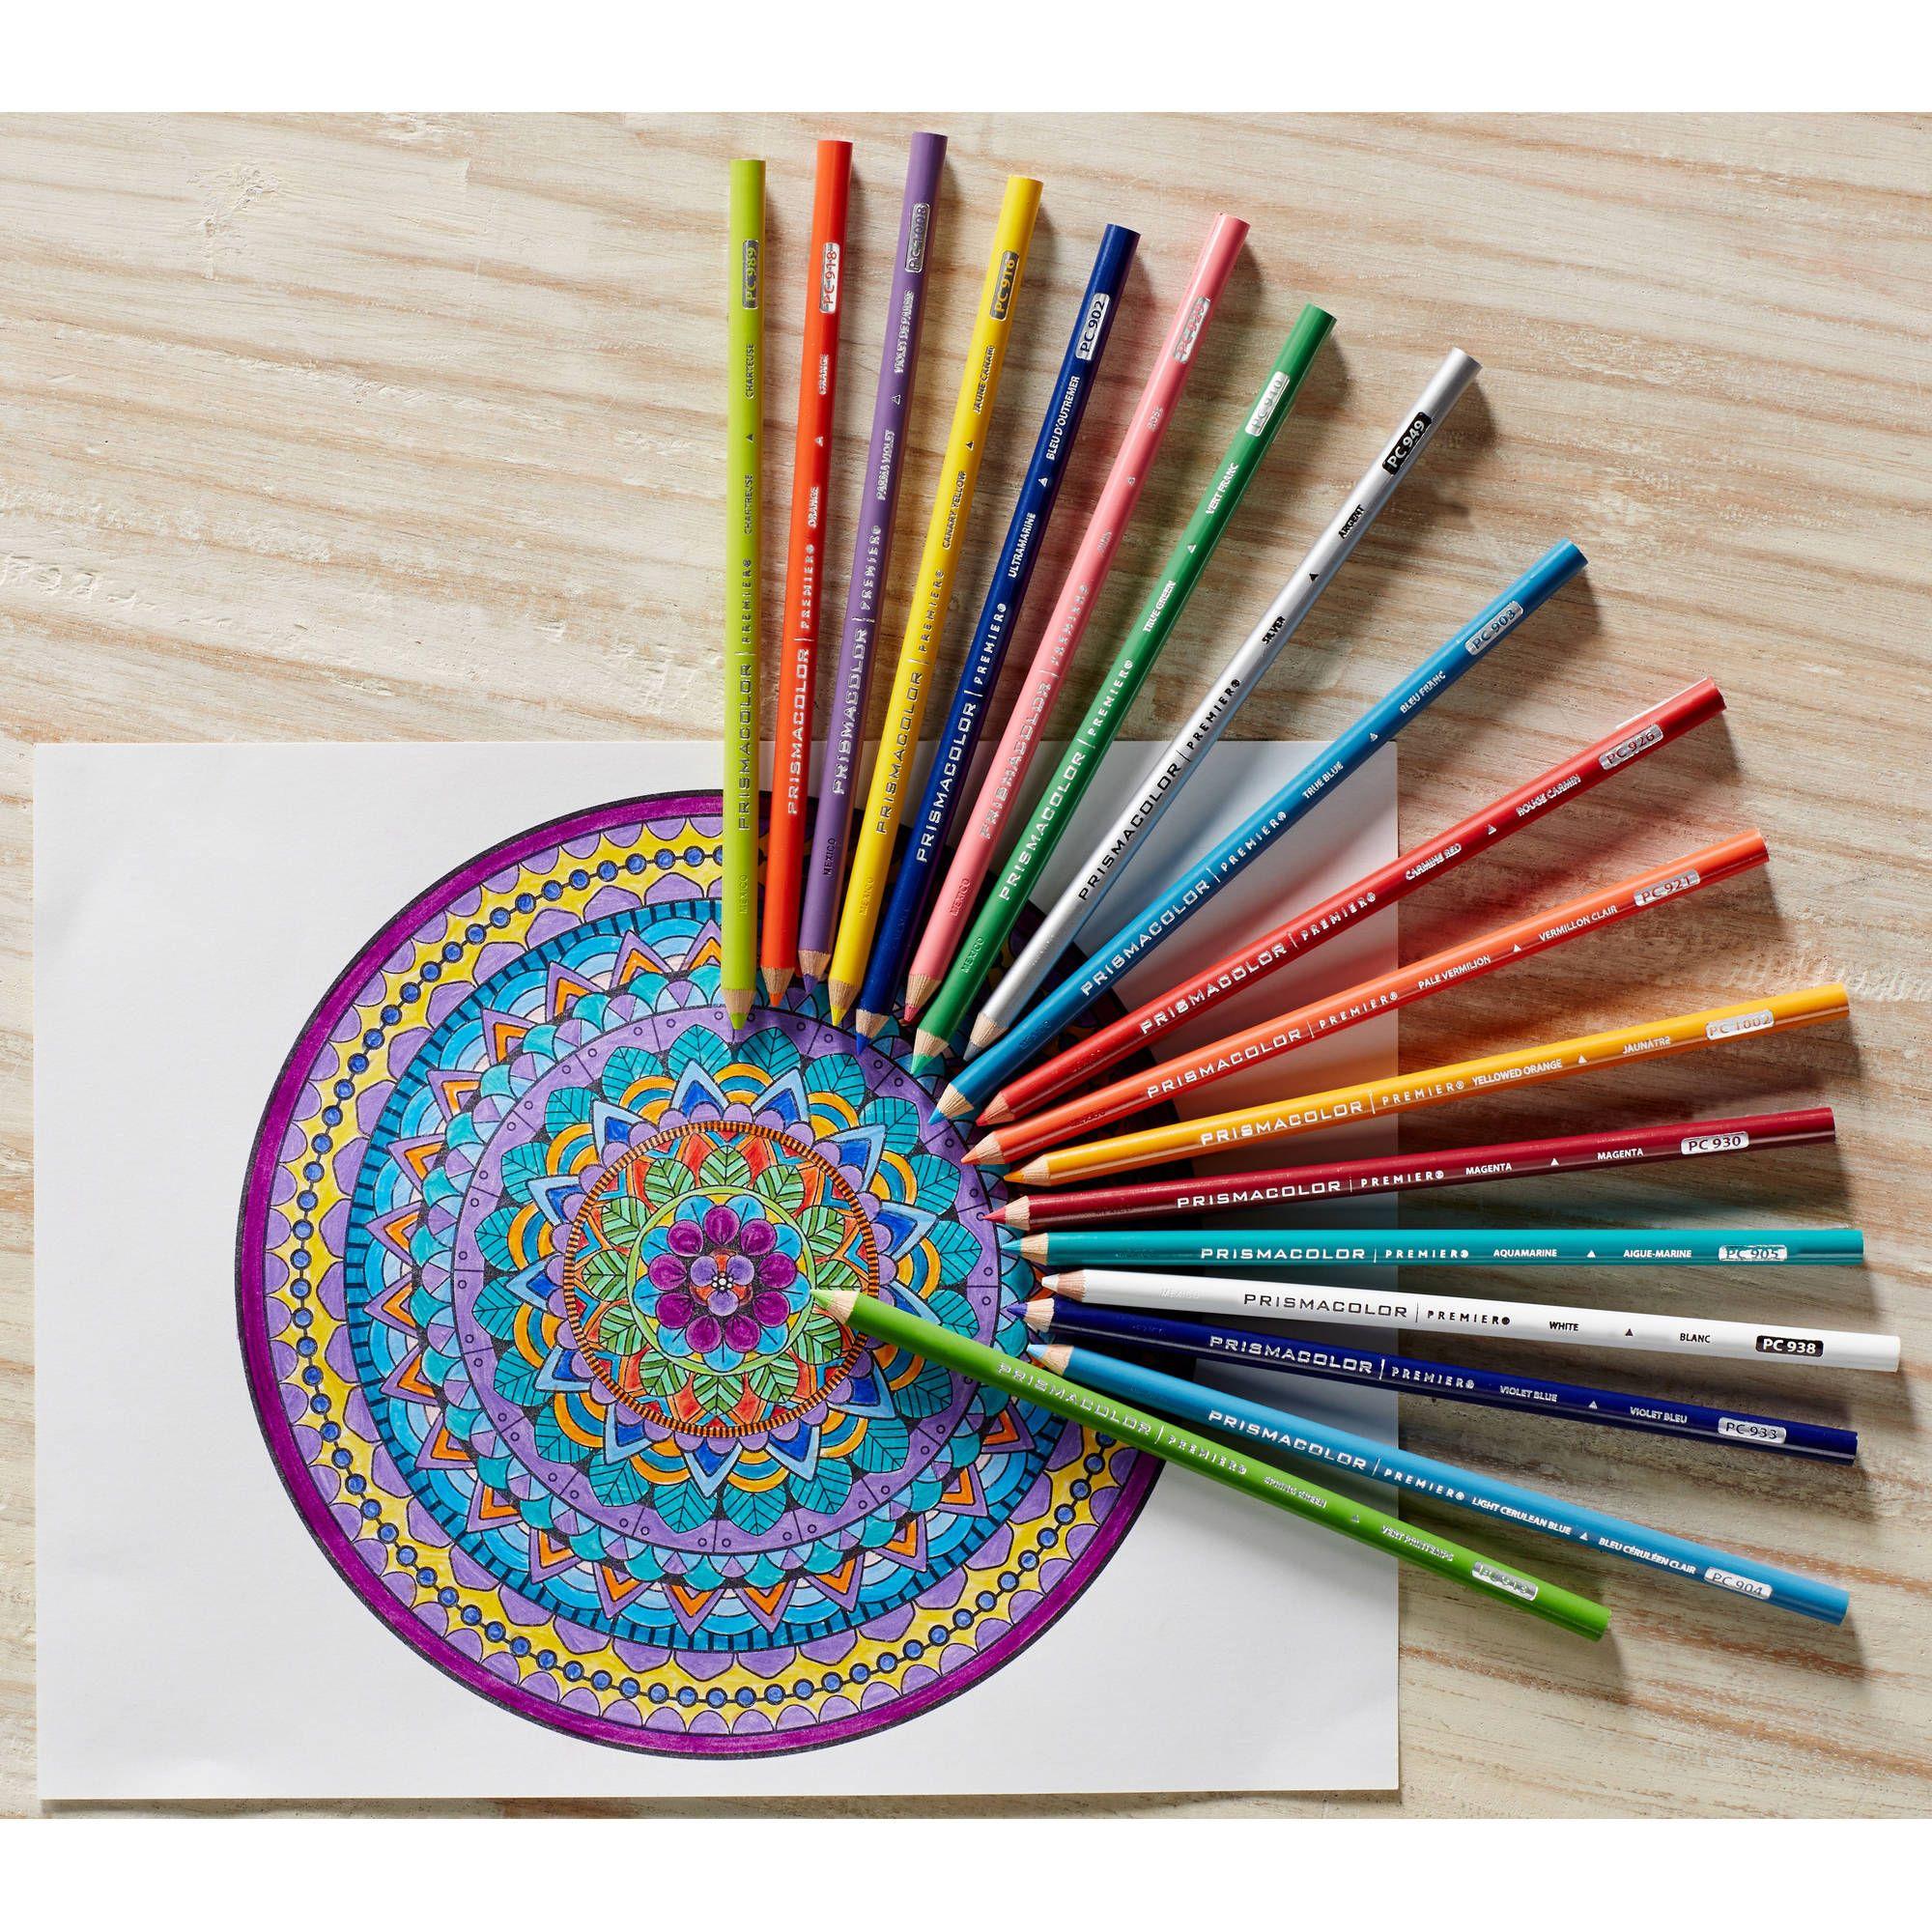 Prismacolor Premier Colored Pencils, Soft Core, 24 Pack in ...